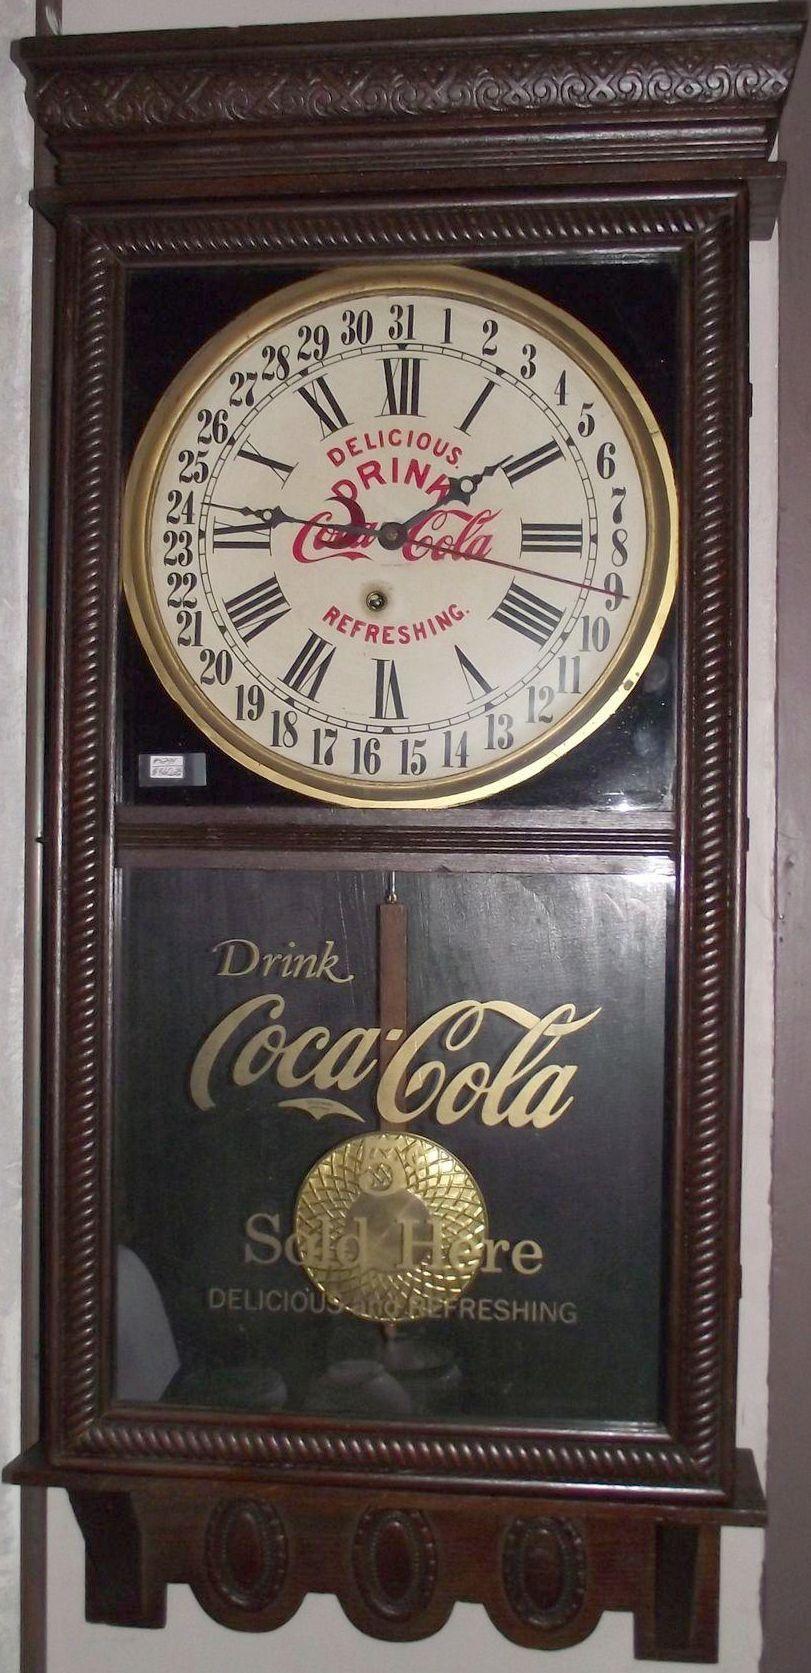 Authentic coca cola advertising store regulator clock with authentic coca cola advertising store regulator clock with calendar date made by the ingraham amipublicfo Choice Image